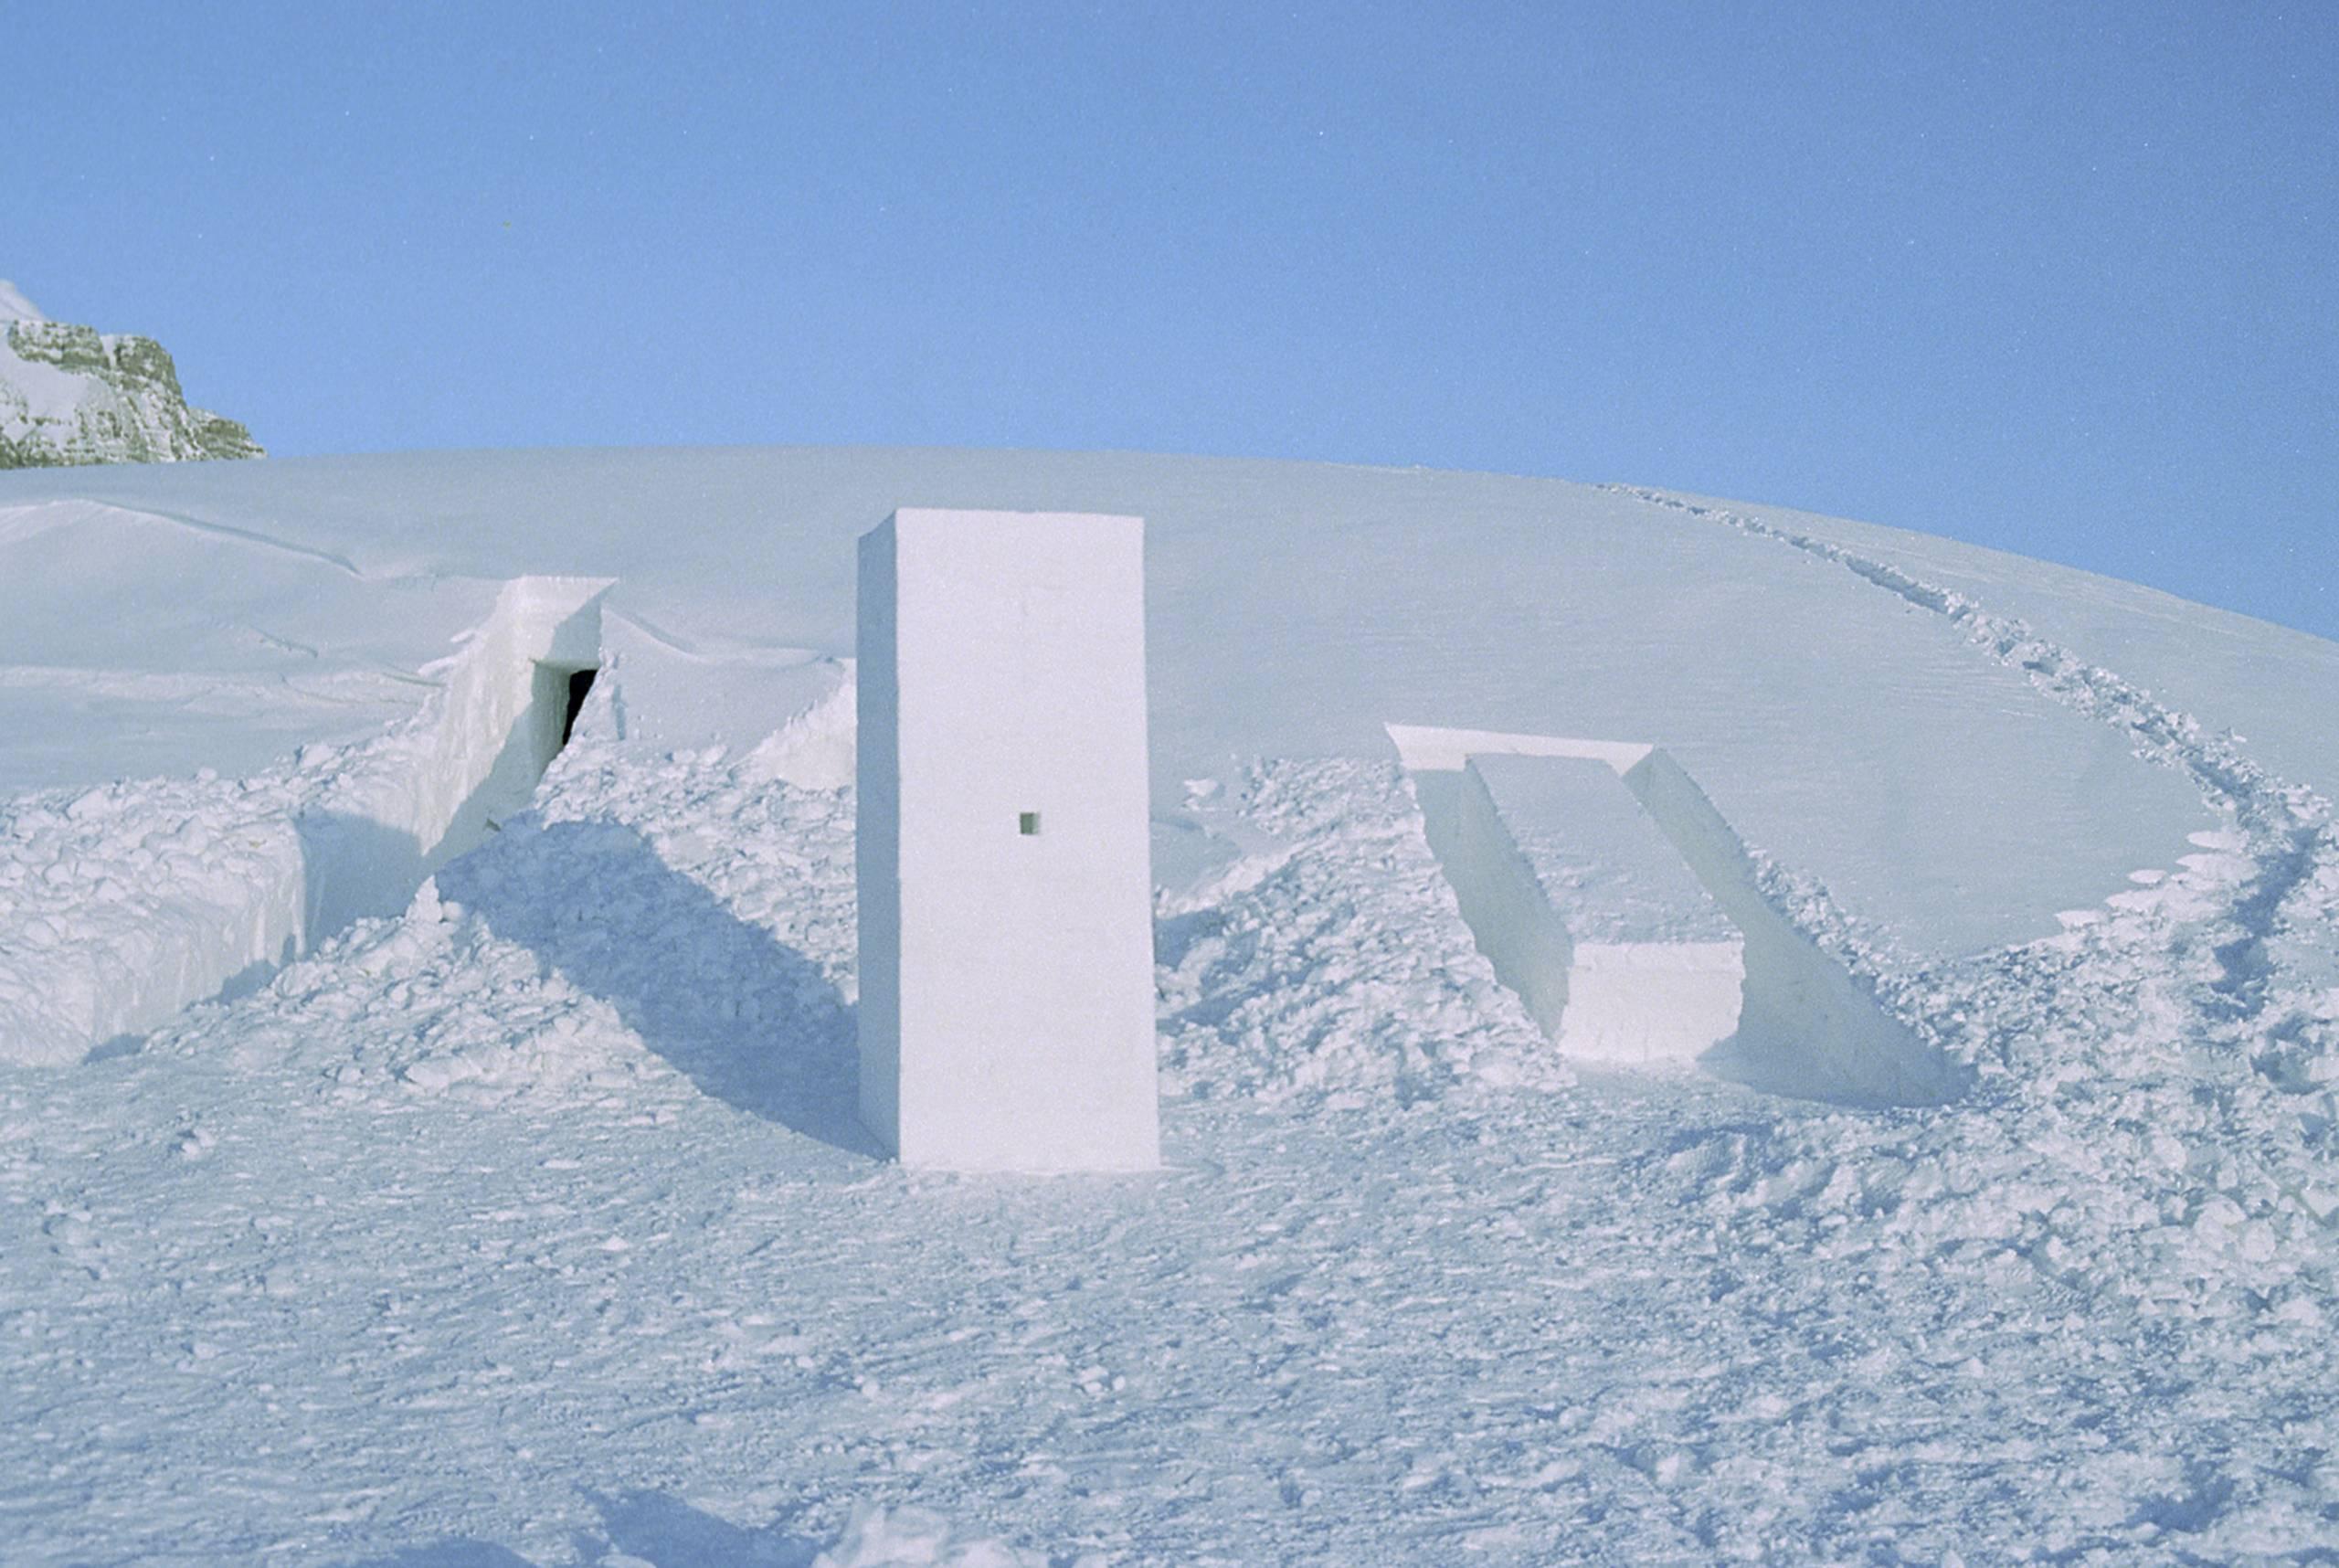 sculptures in arctic landscape